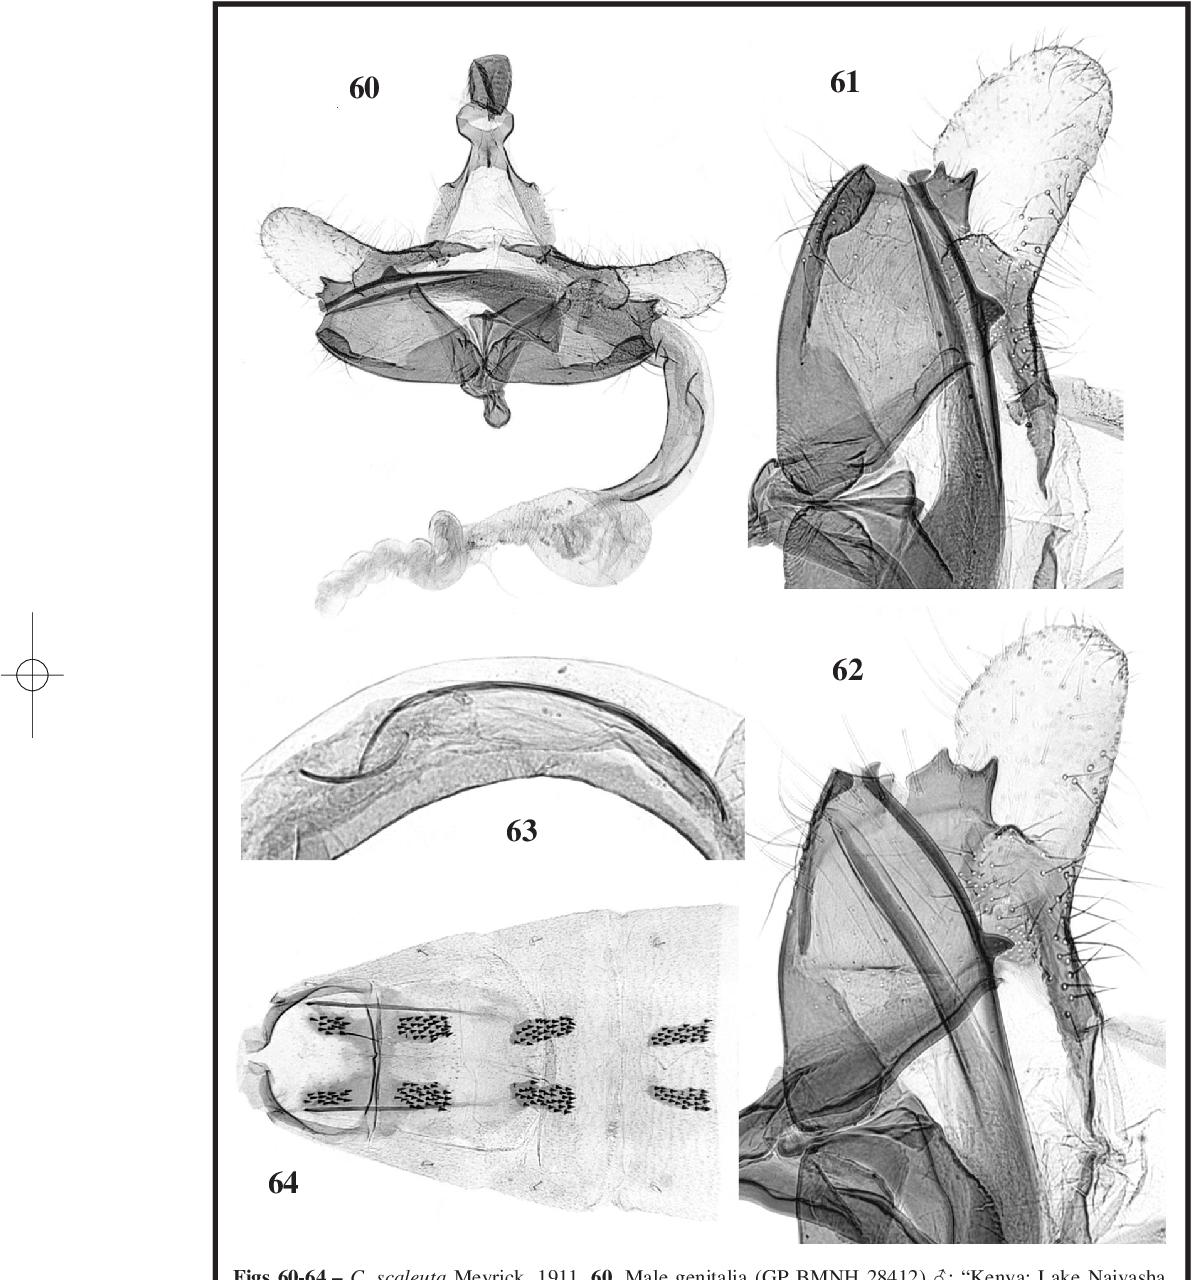 figure 60-64